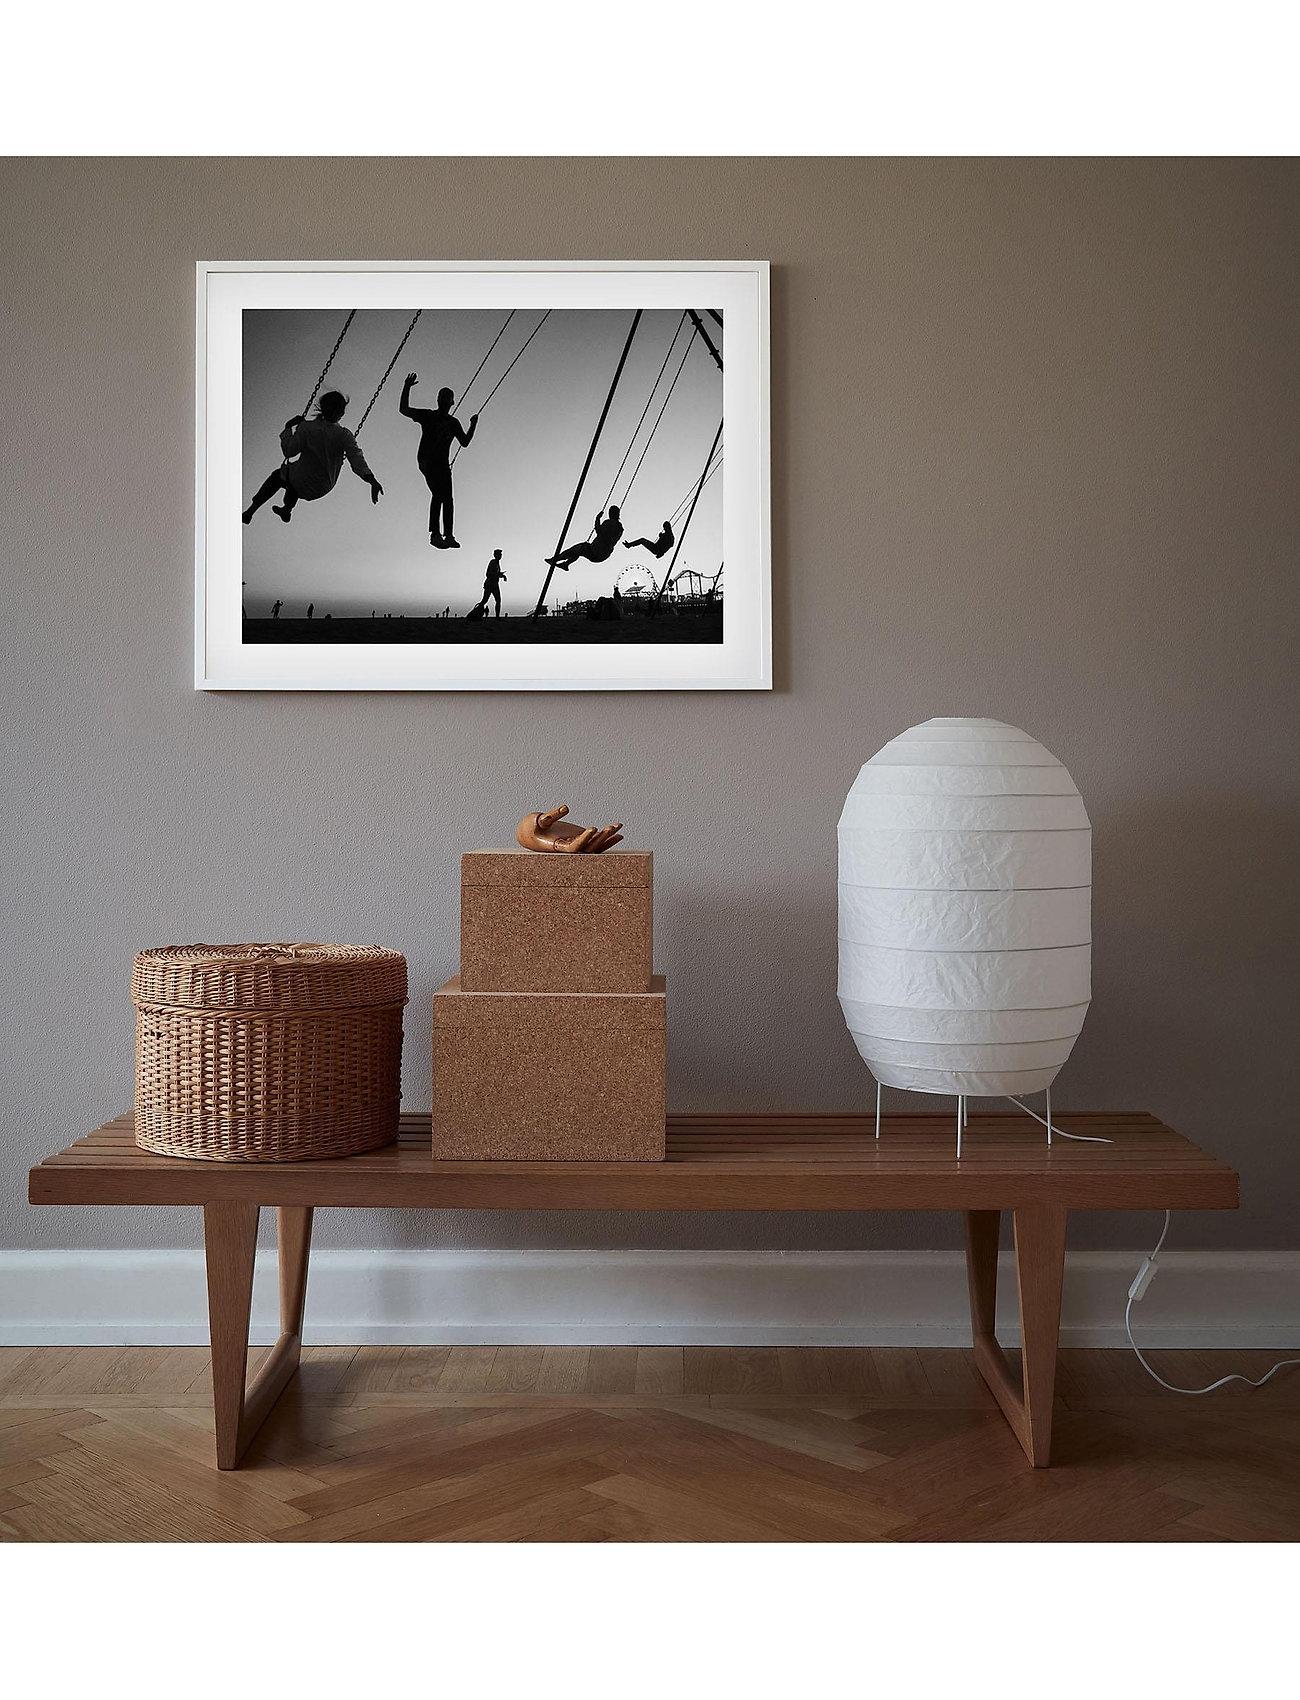 Democratic Gallery - Poster Silhouette Swing - home decor - black - 1